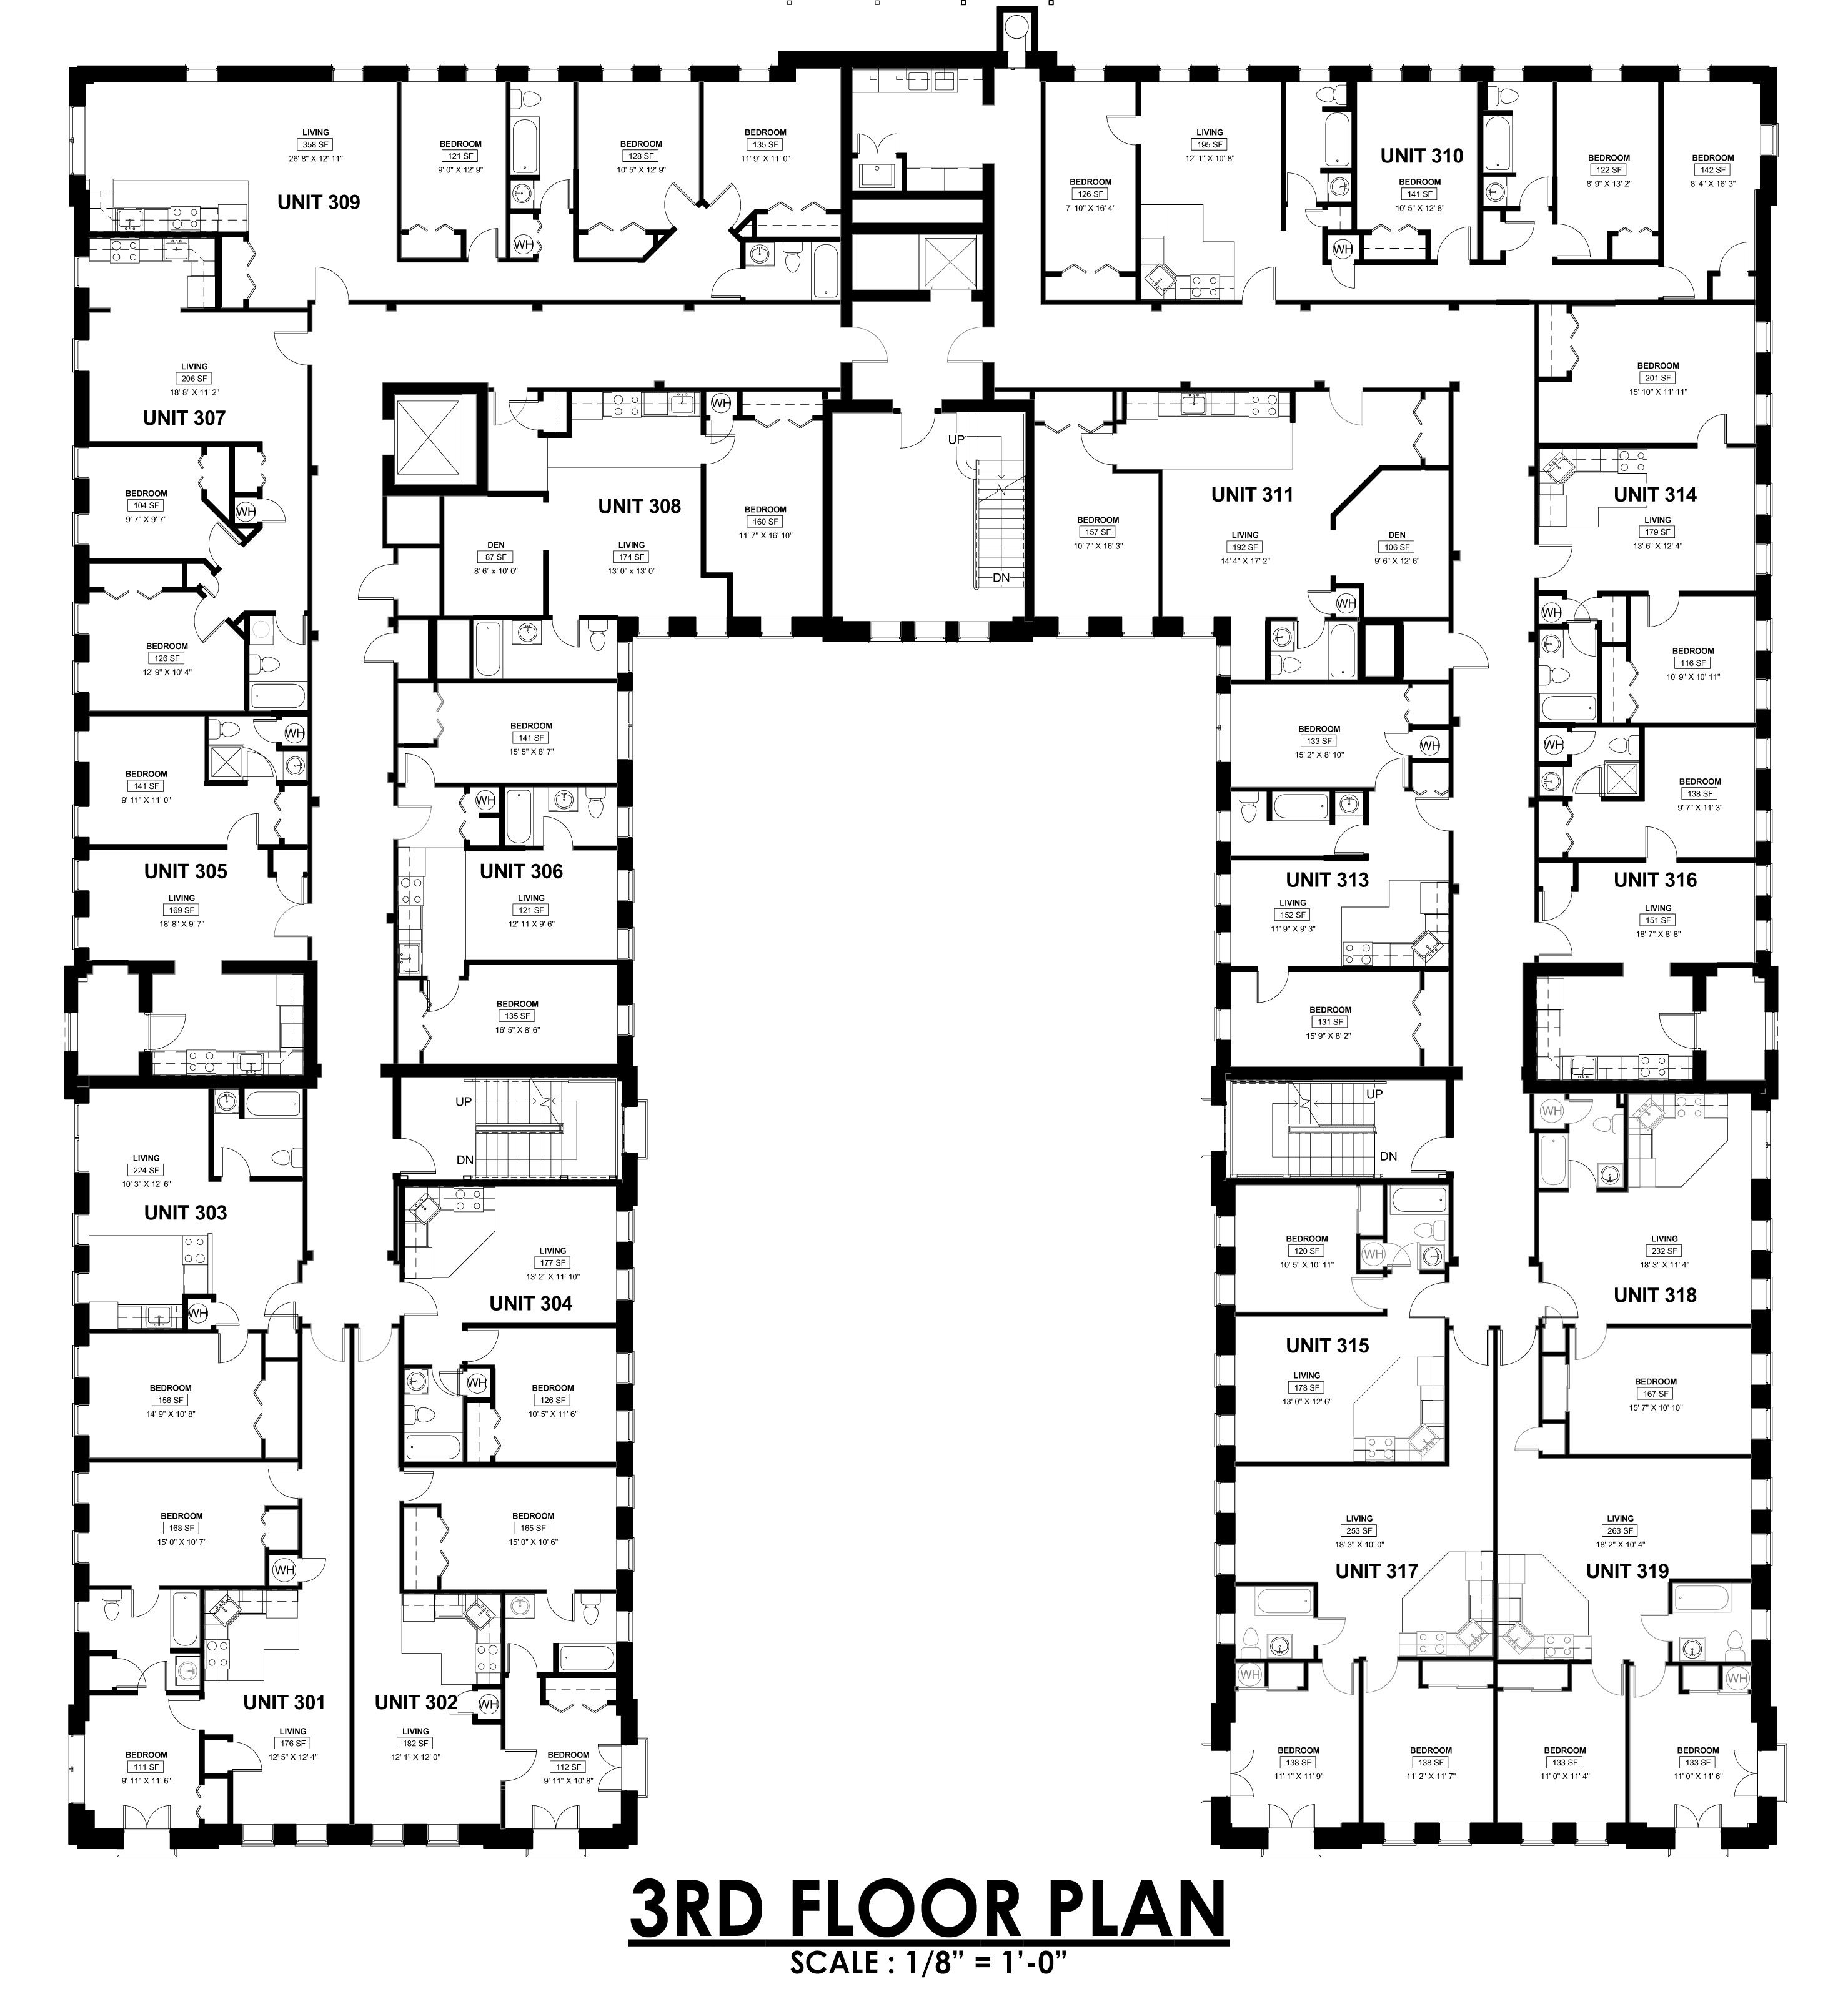 Resultado De Imagem Para Architecture Plans For Students Residence Architecture Plan How To Plan Floor Plans